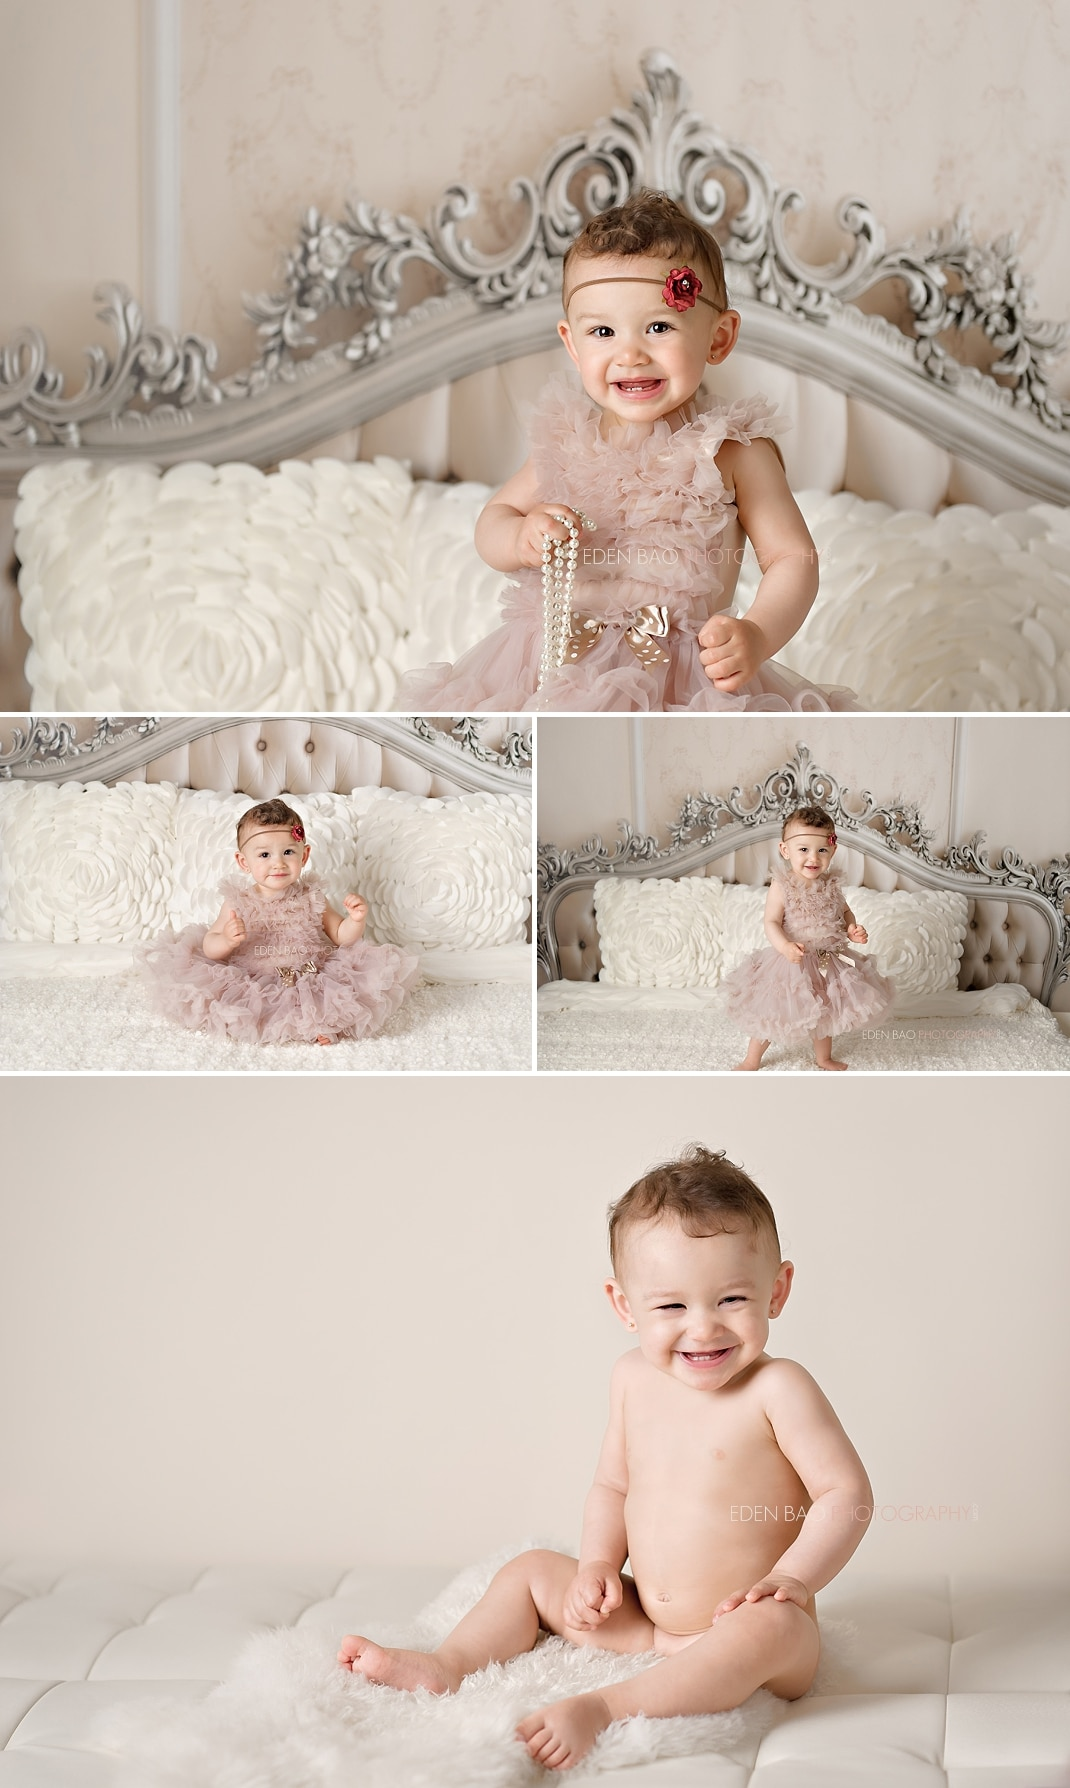 Surrey Vancouver BC Baby Photographer elegant headboard